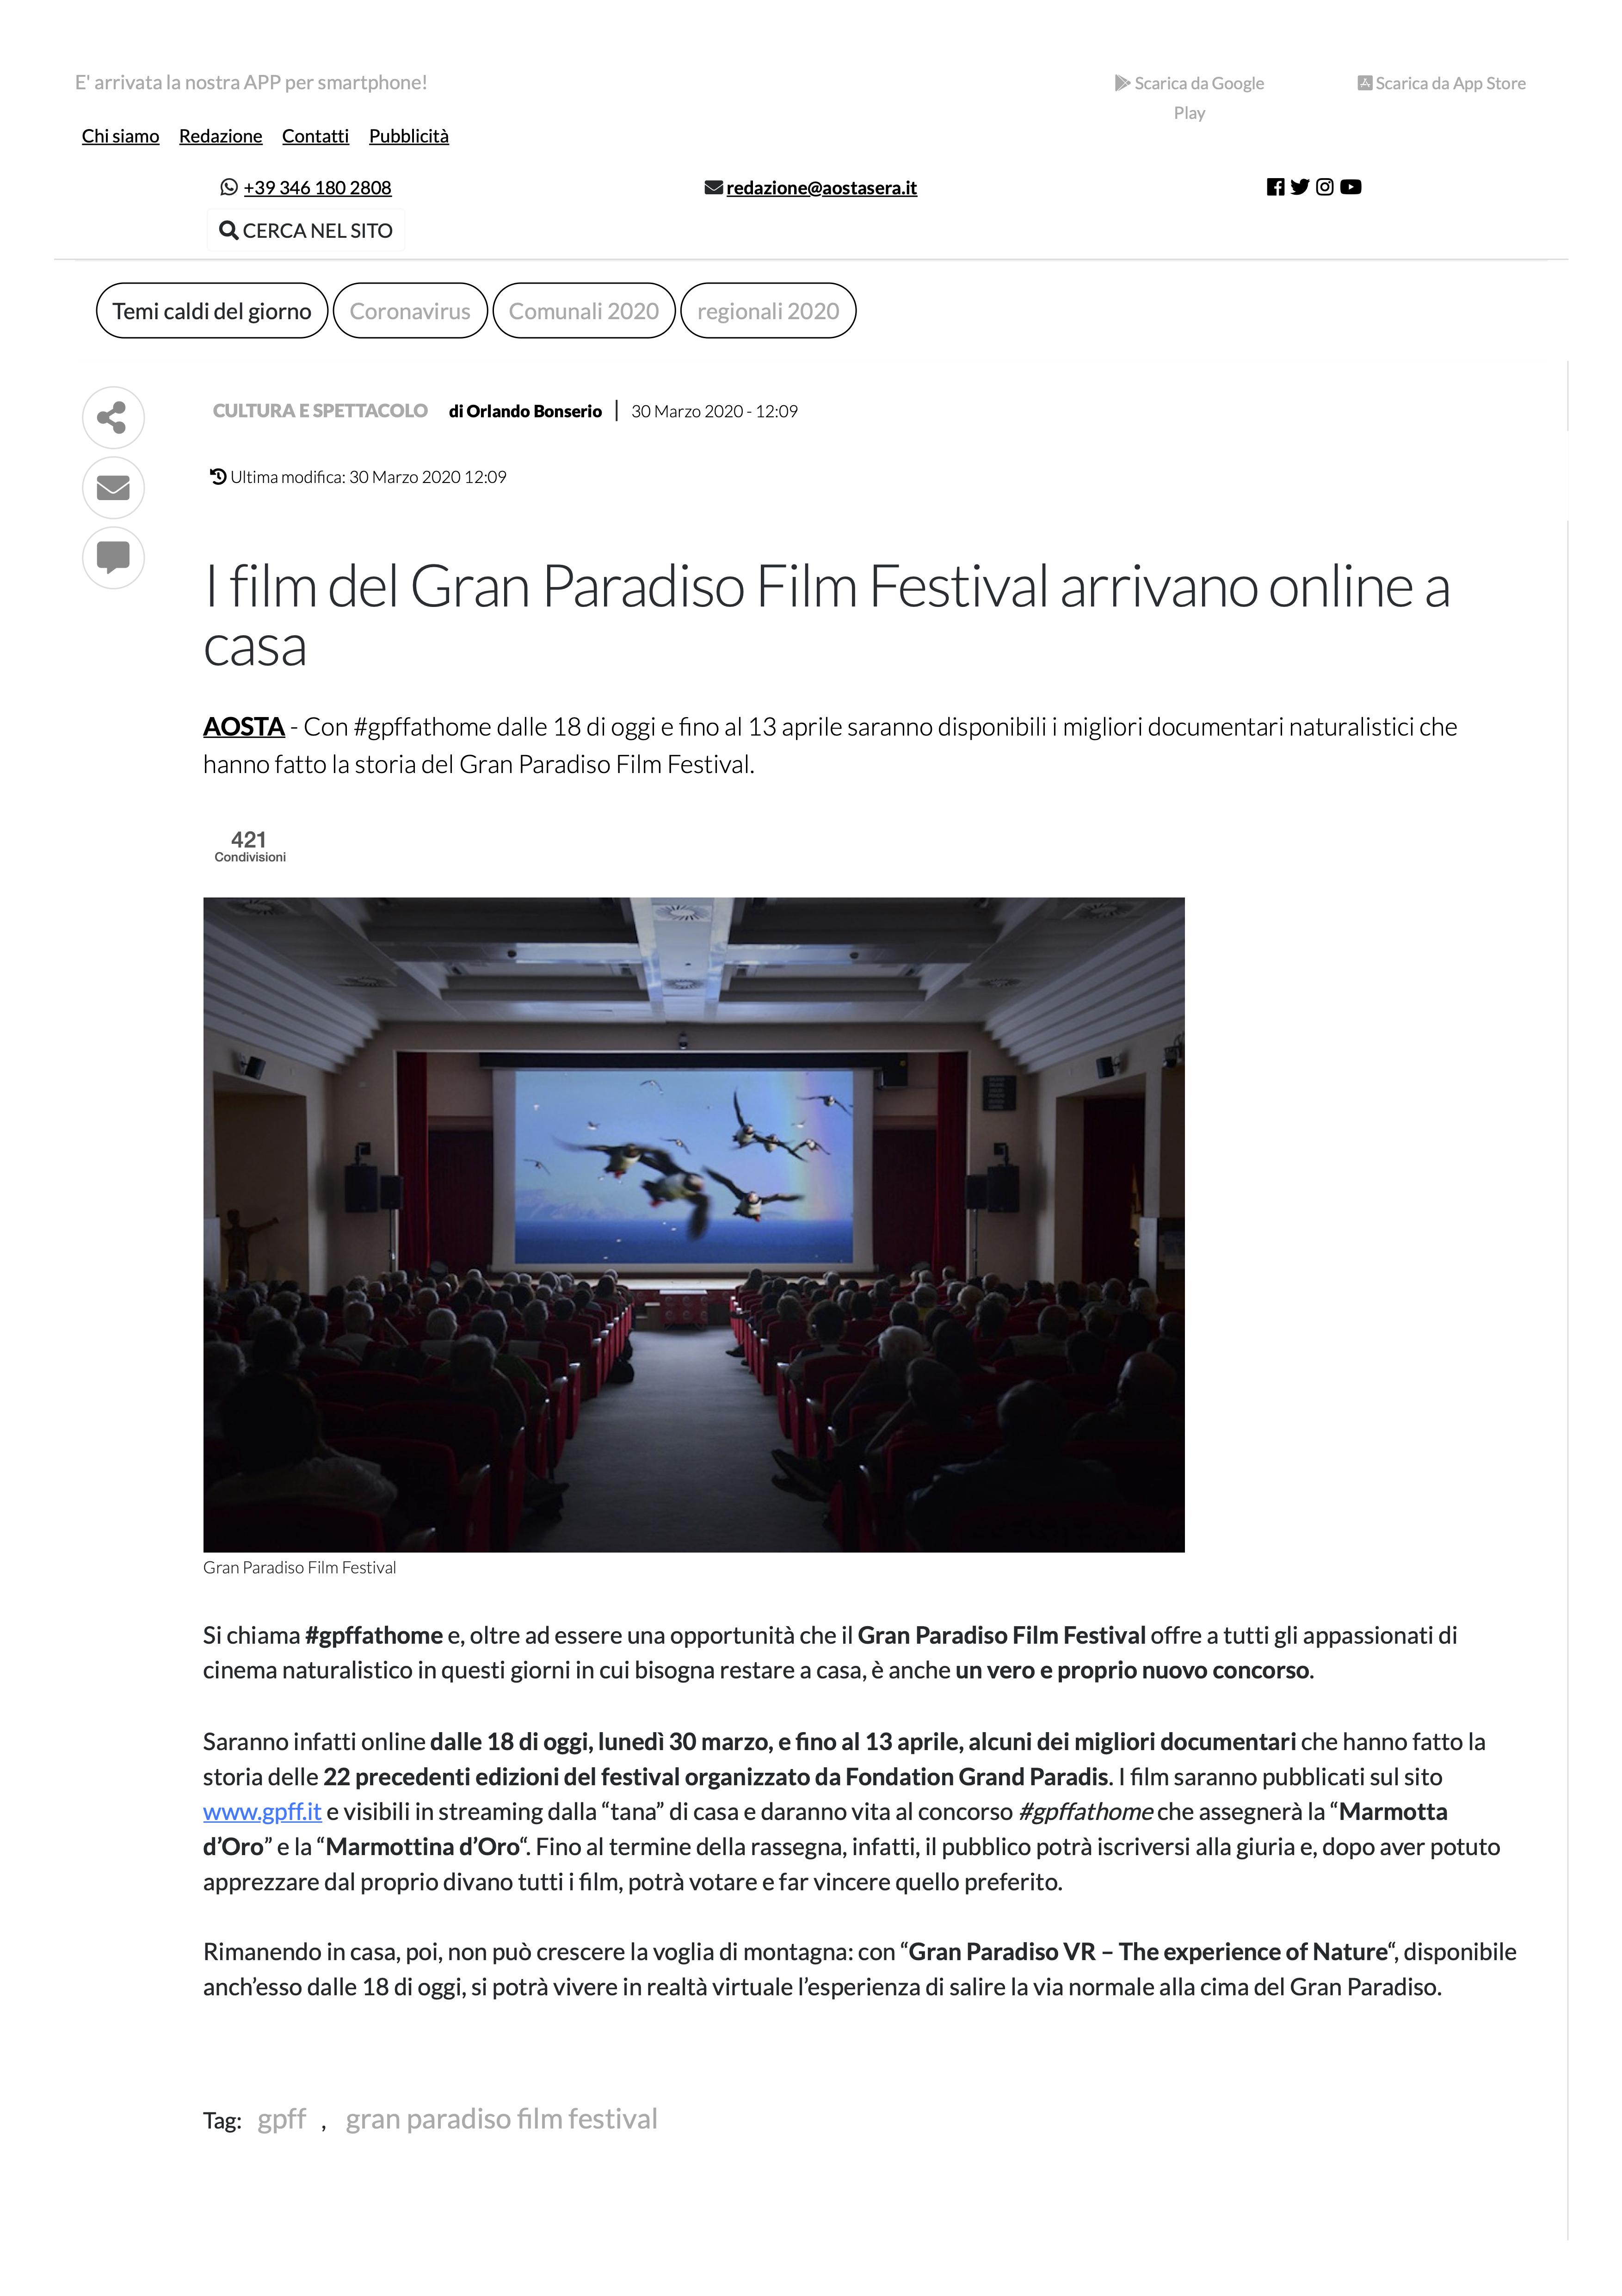 gpff gran paradiso film festival natura film festival gran paradiso documentari